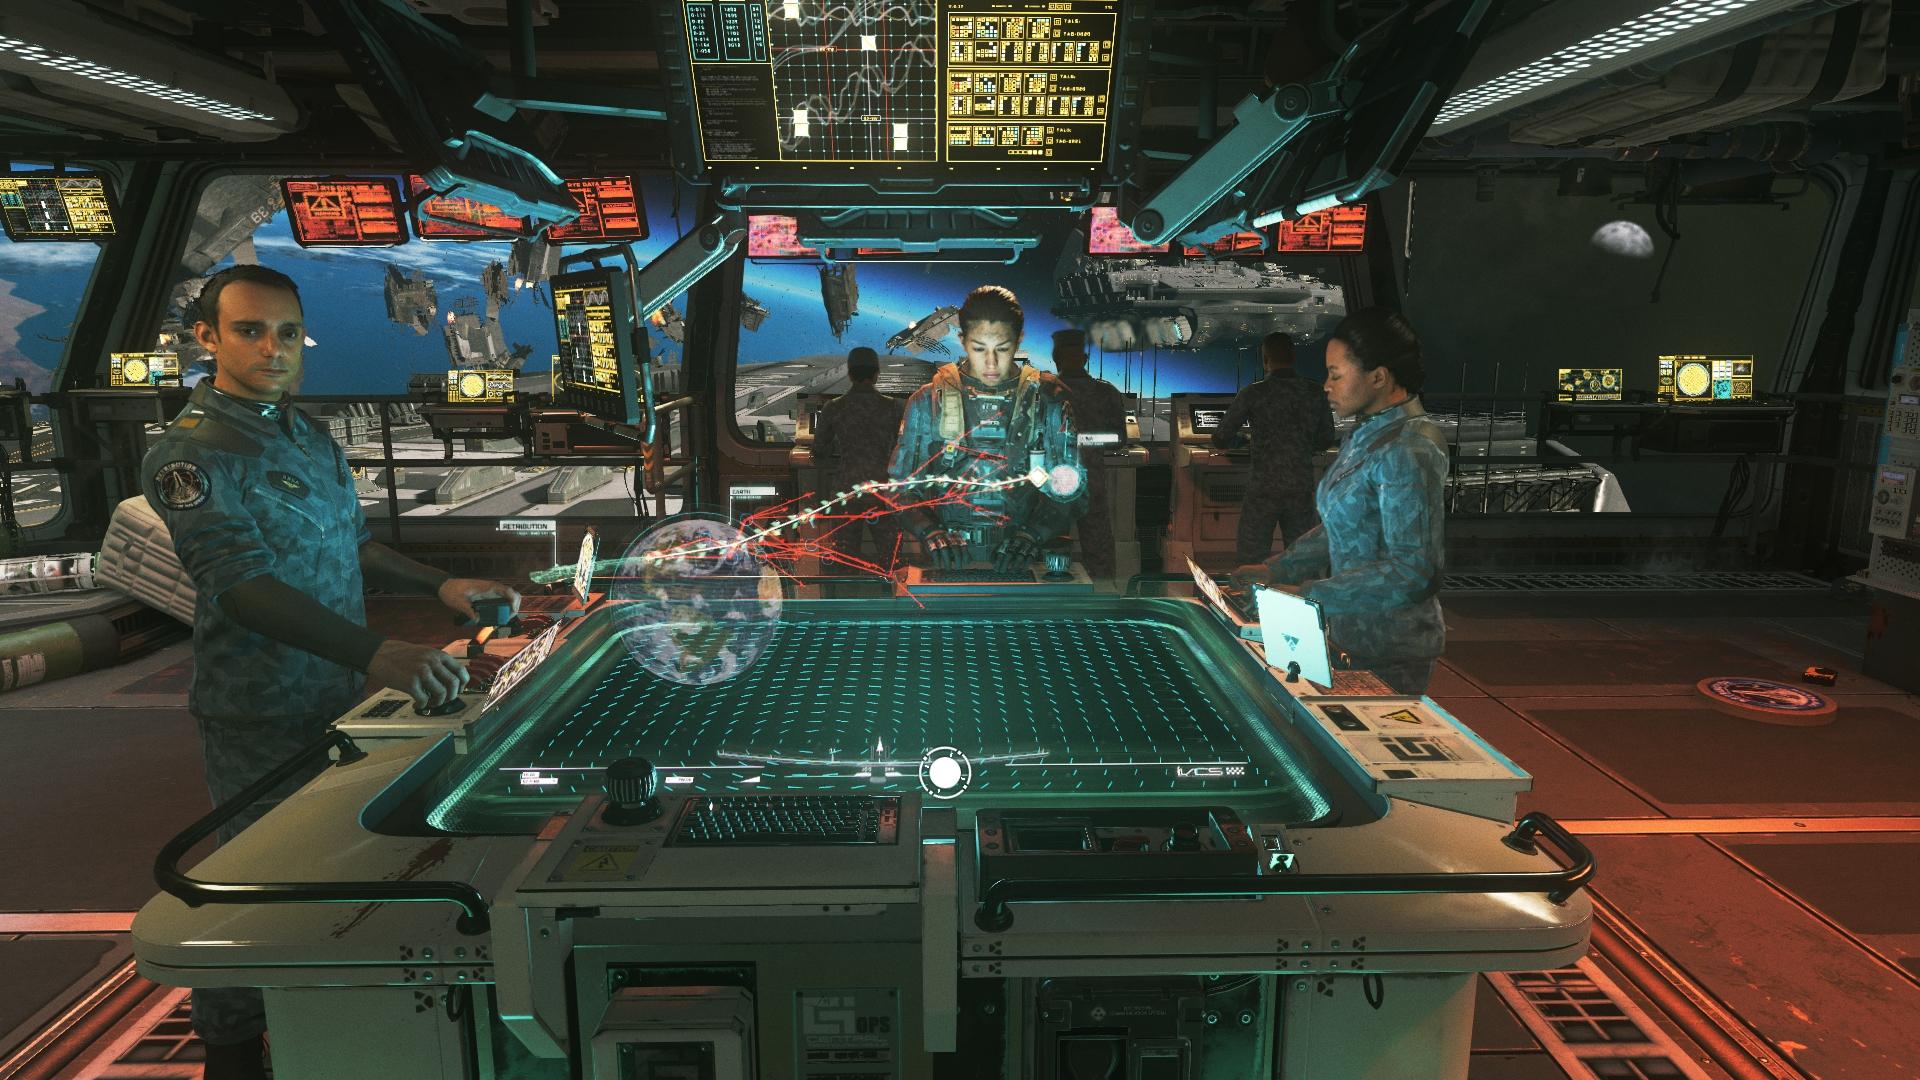 00030.Jpg - Call of Duty: Infinite Warfare